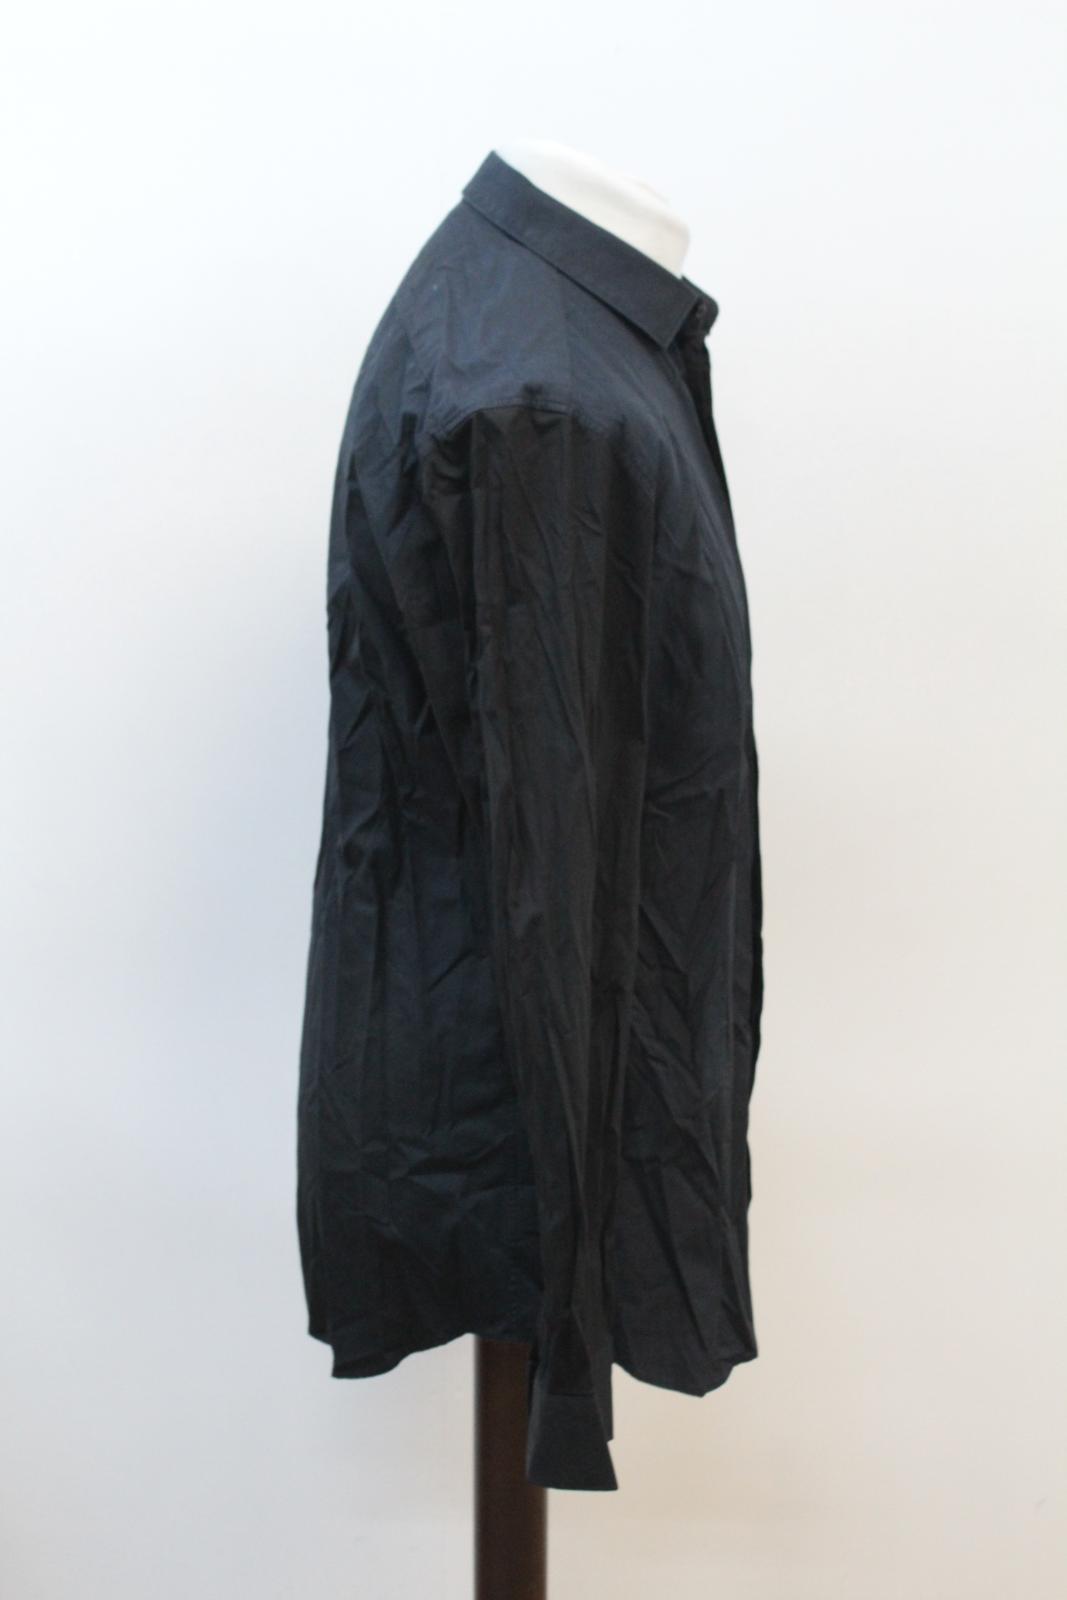 Neil-Barrett-Hombre-Azul-Manga-Negra-Cuello-Camisa-de-impresion-Corbata-Slim-Fit-16-5-034-42cm miniatura 4